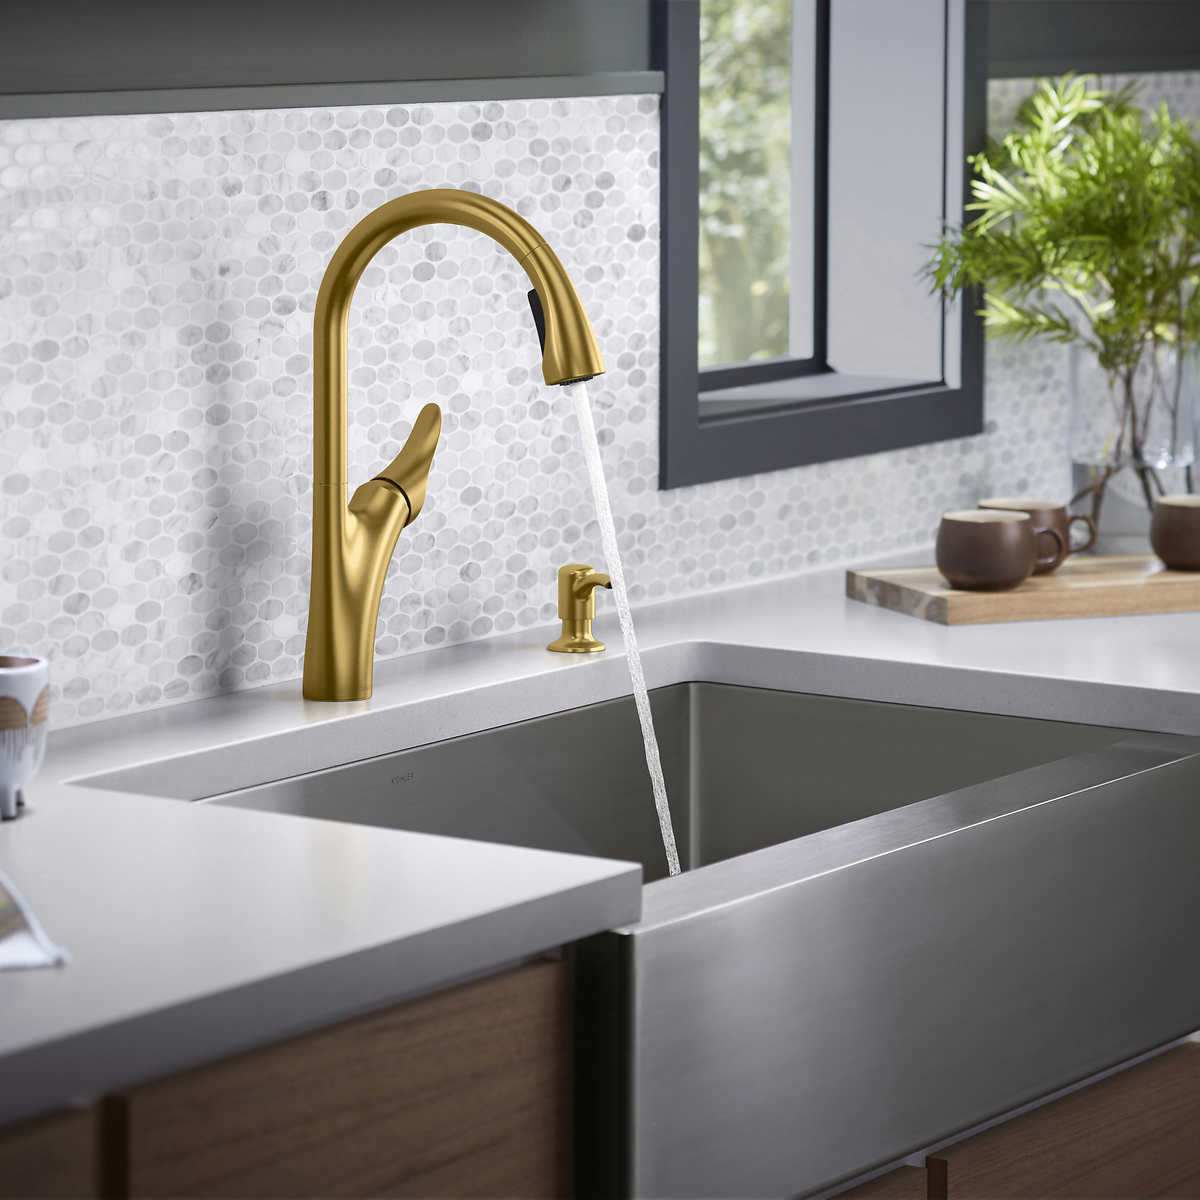 Kohler Transitional Touchless Kitchen Faucet Costco